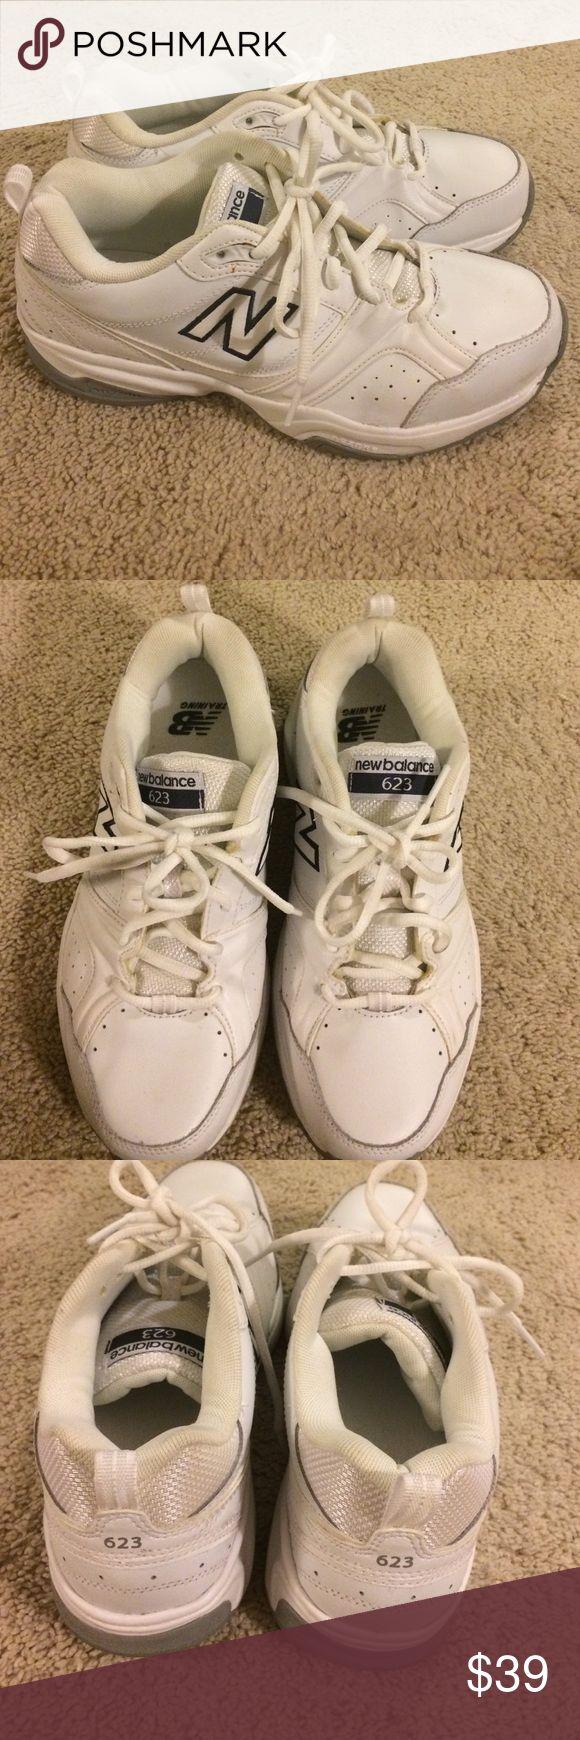 NWOT New Balance 623 Cross Trainer Pertect unworn New Balance cross trainer 623. New Balance Shoes Athletic Shoes